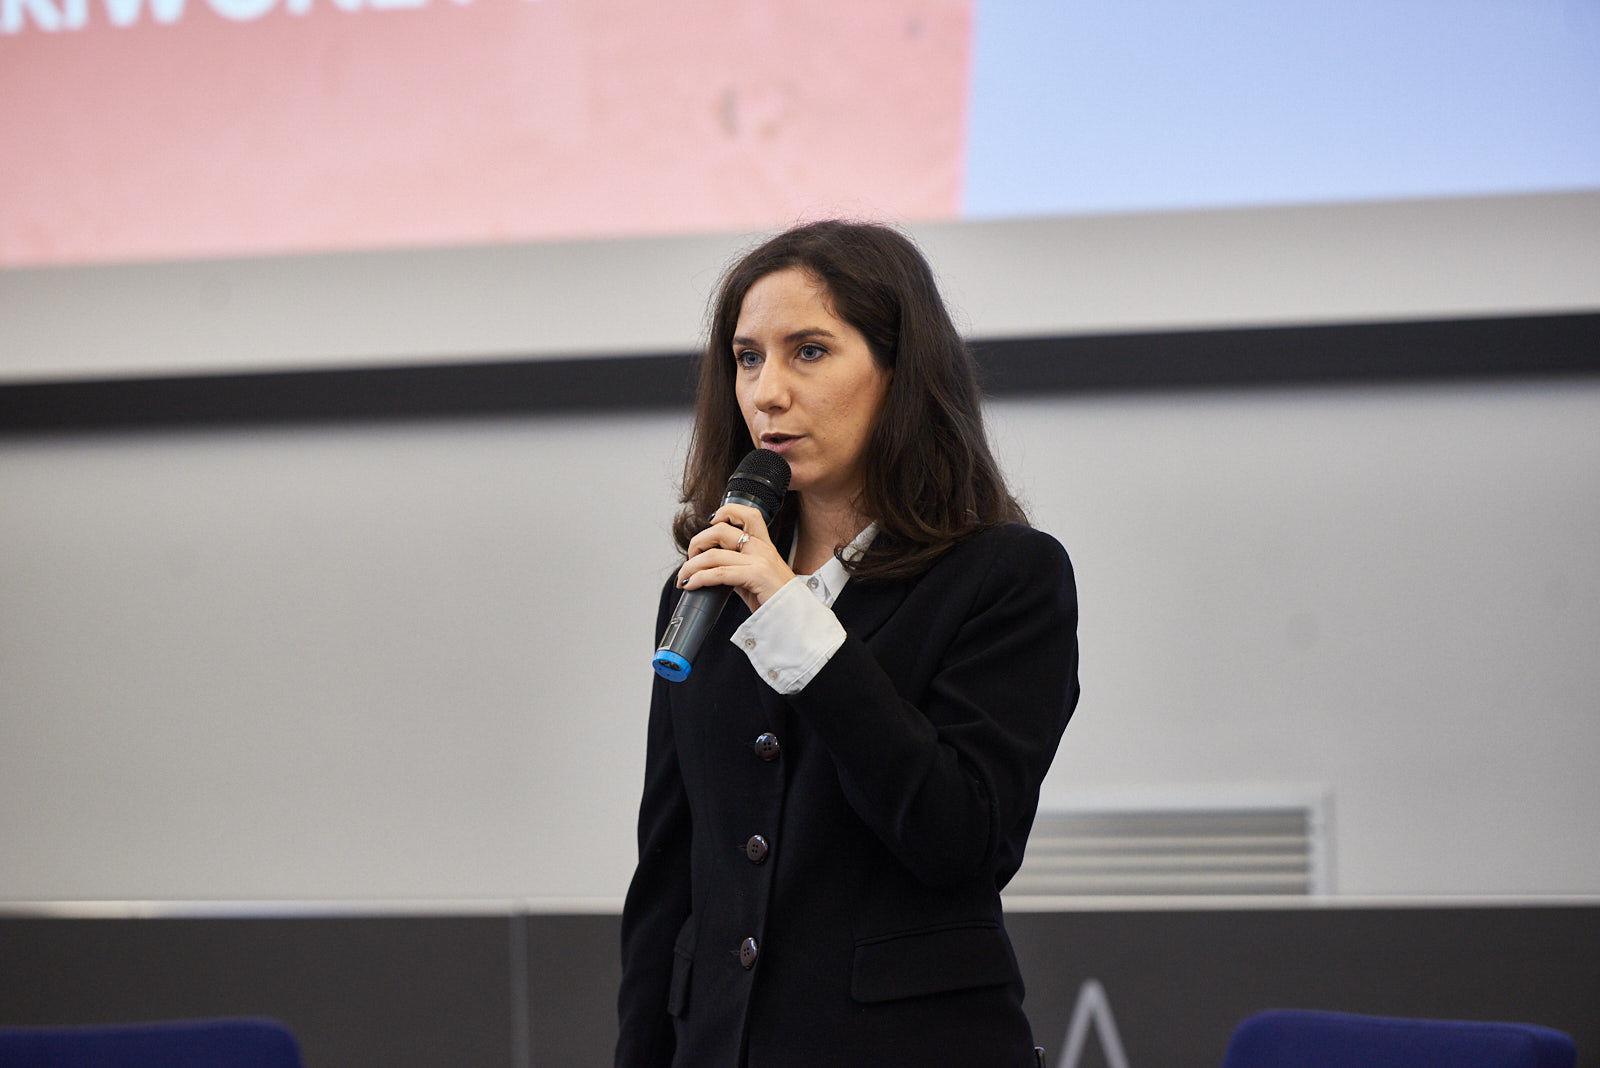 Martina Landi, head of the Gariwo editorial staff and moderator